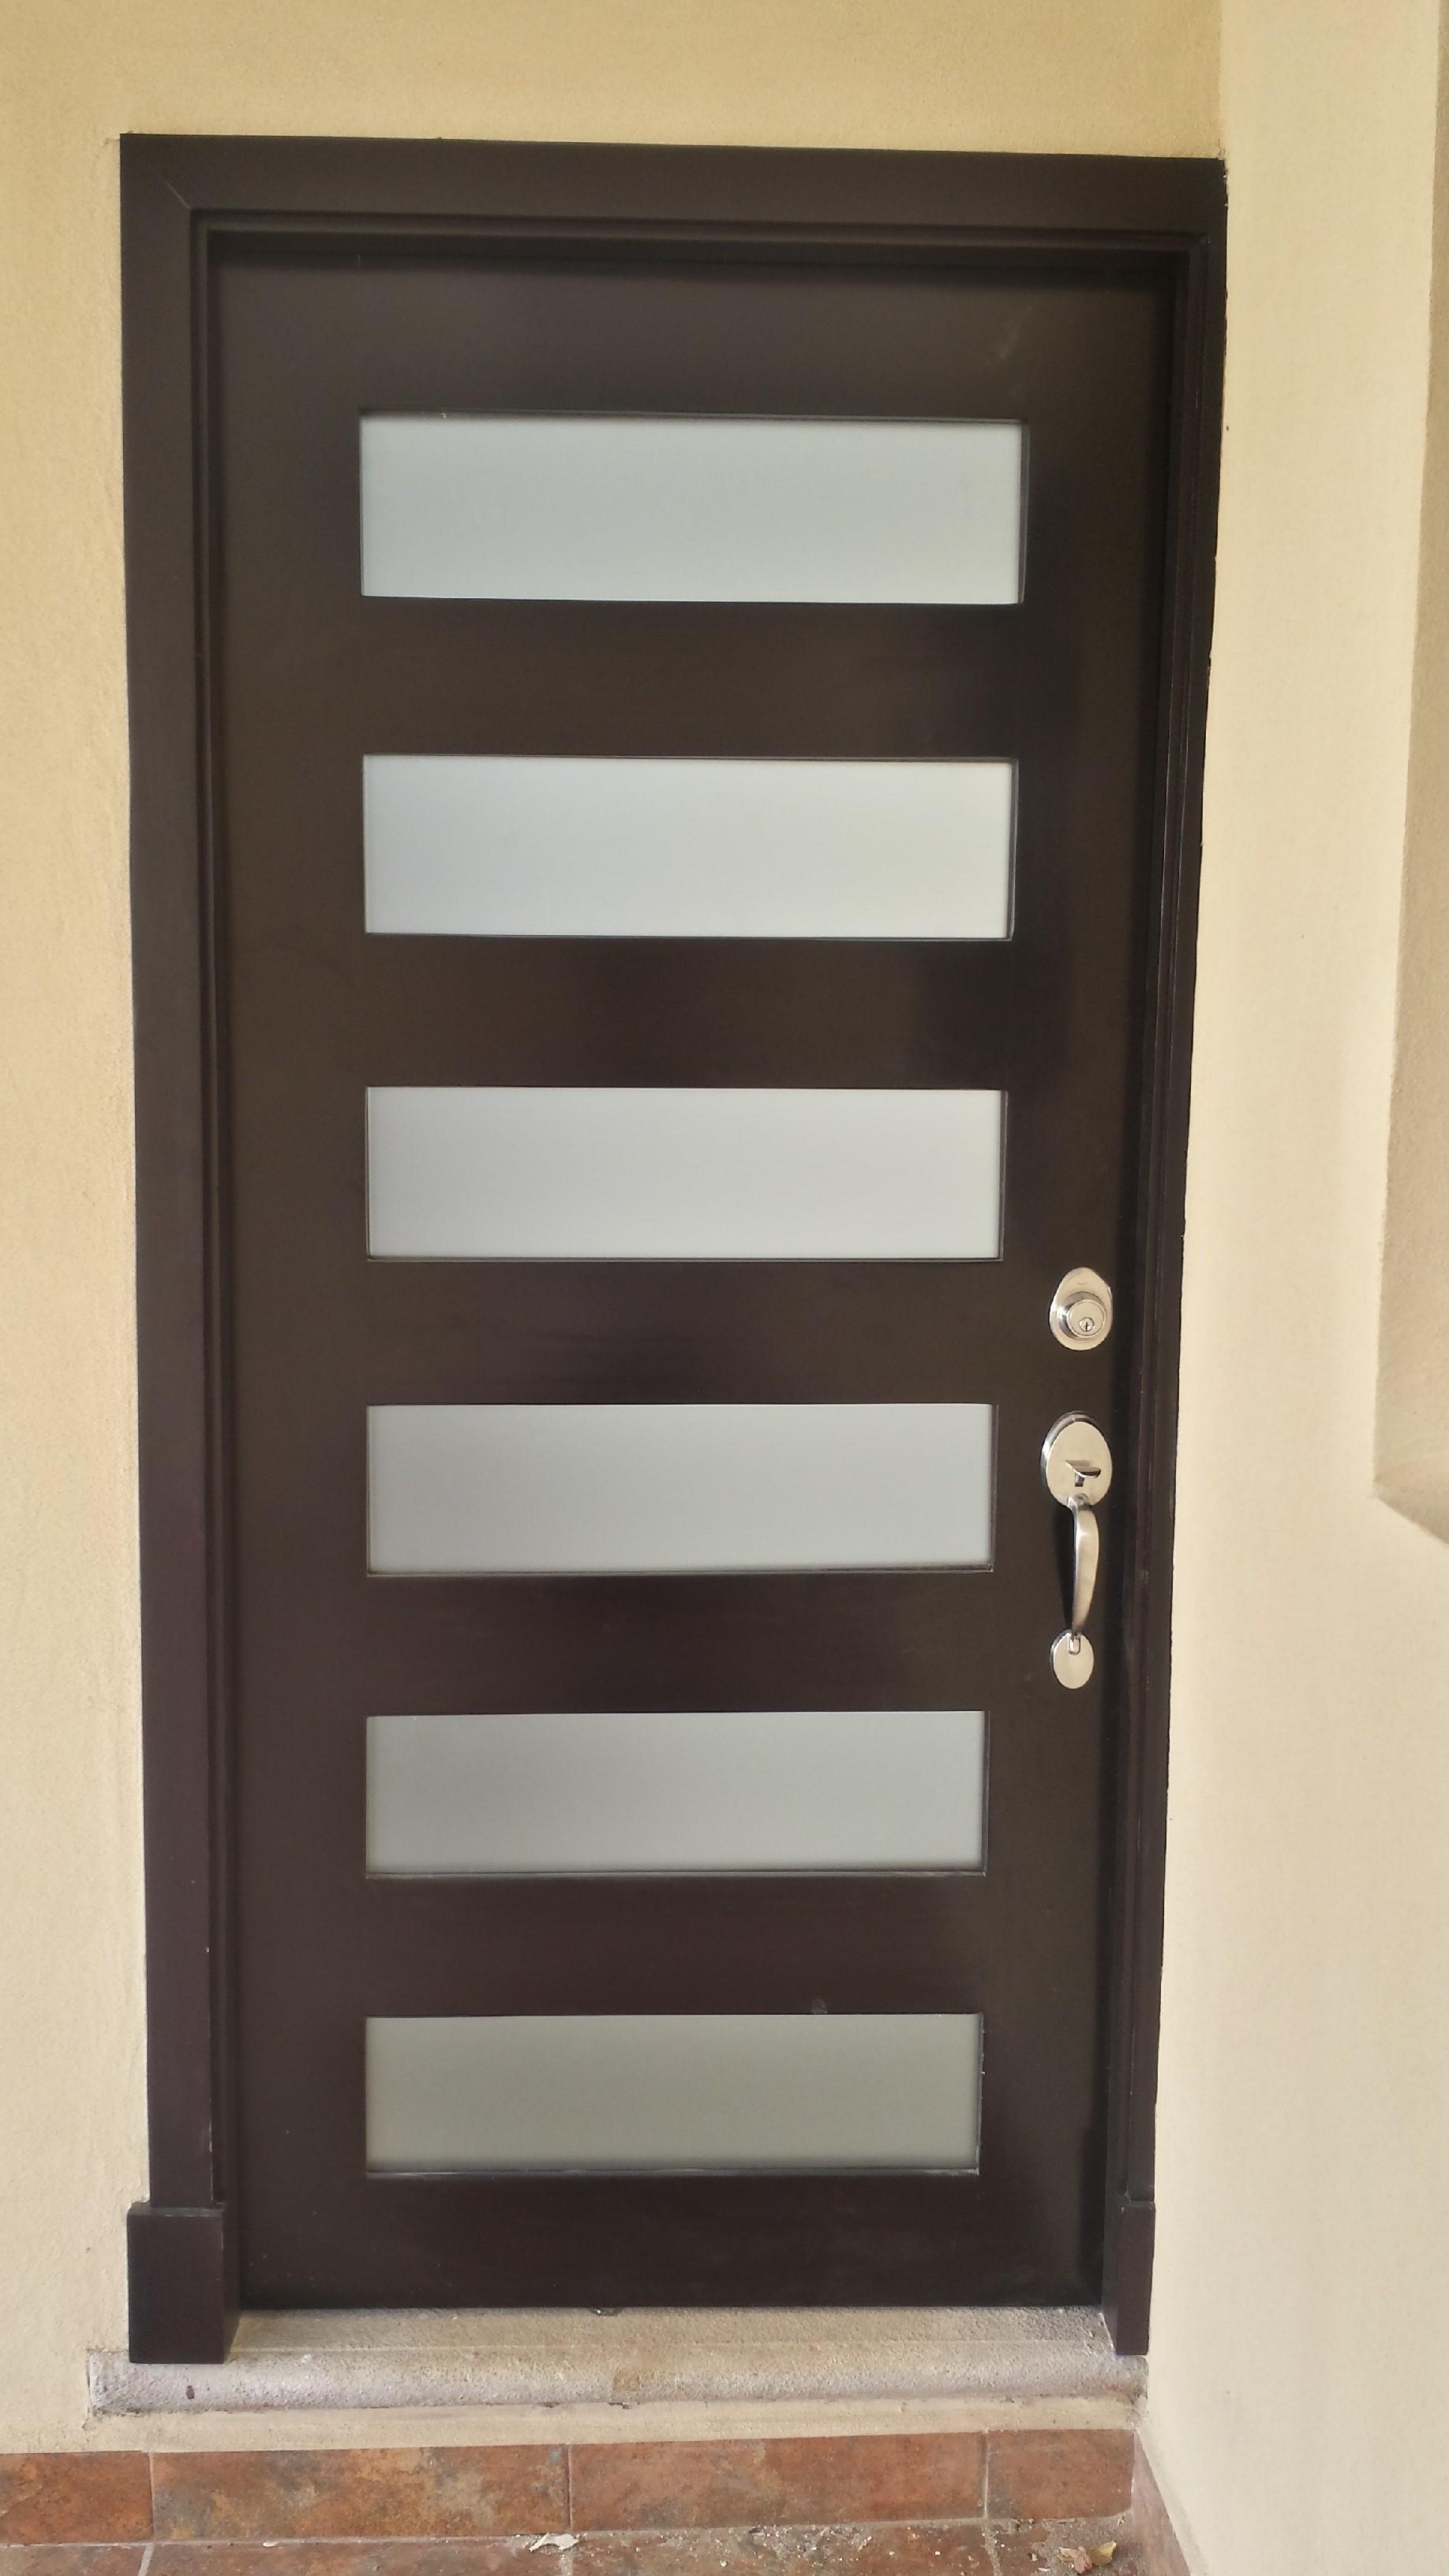 Modelos de puertas de madera puertas de madera a la for Modelos d puertas